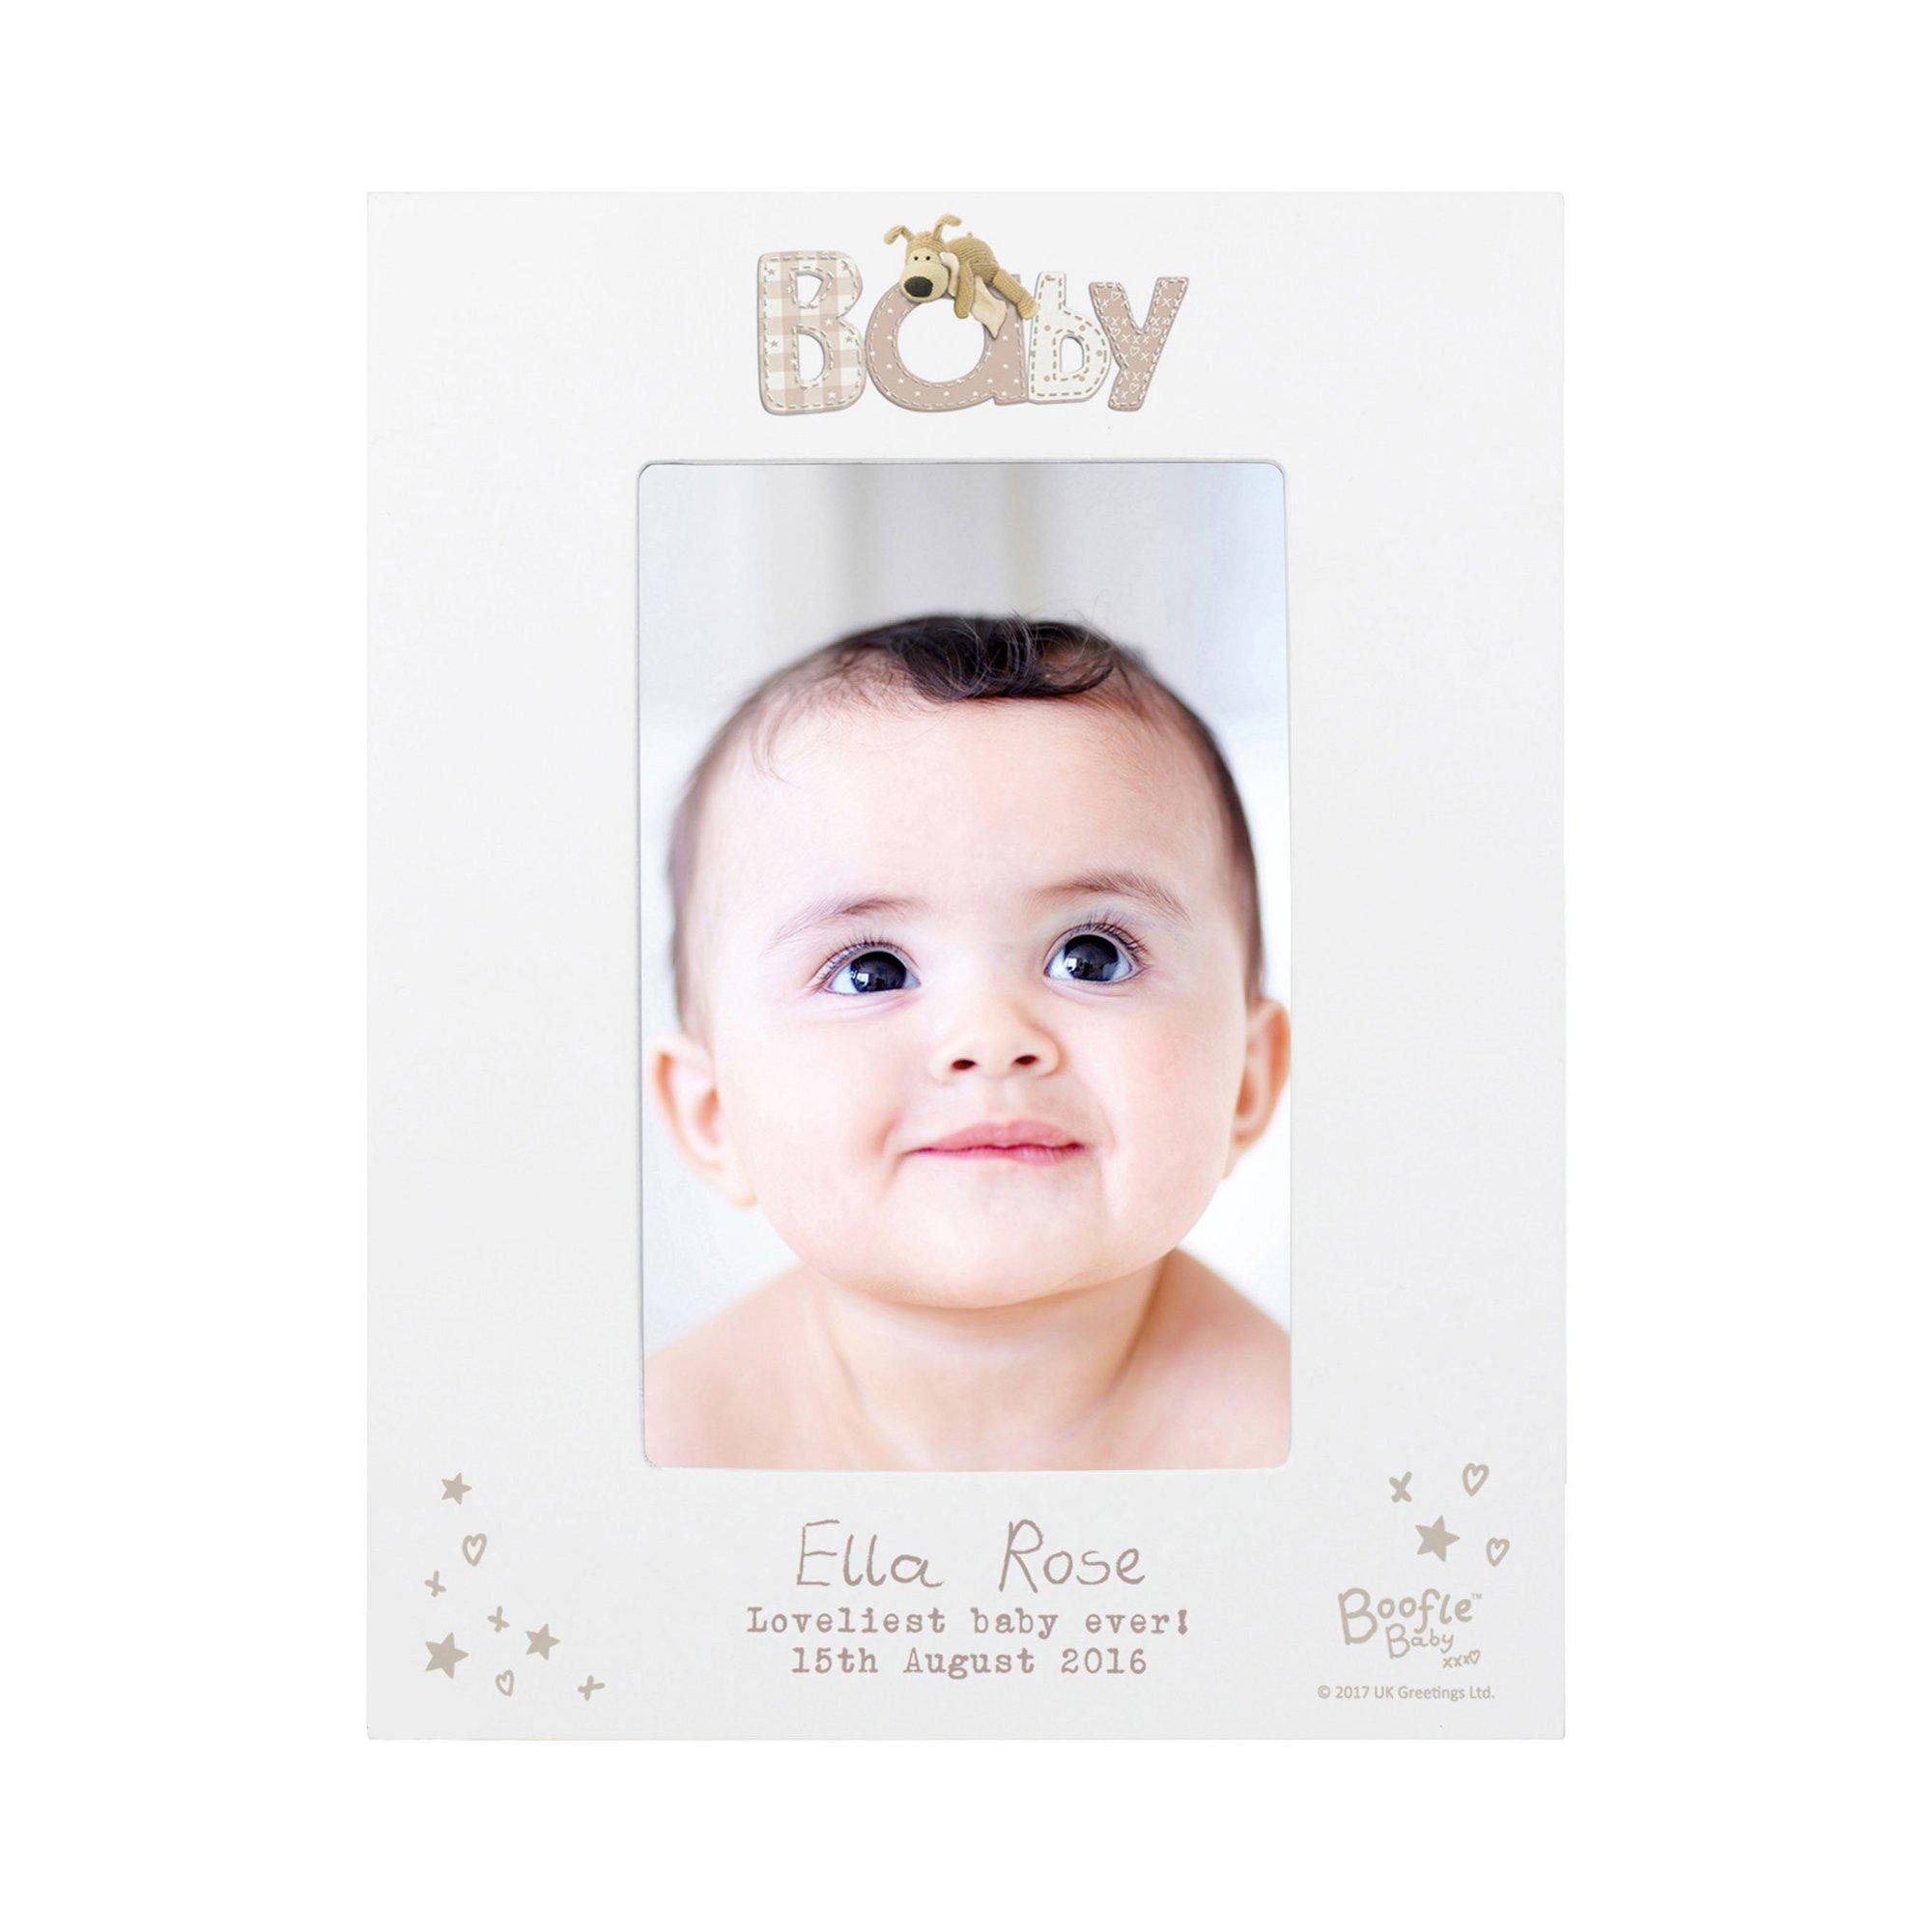 Image of Personalised Boofle Baby 6x4 Photo Frame